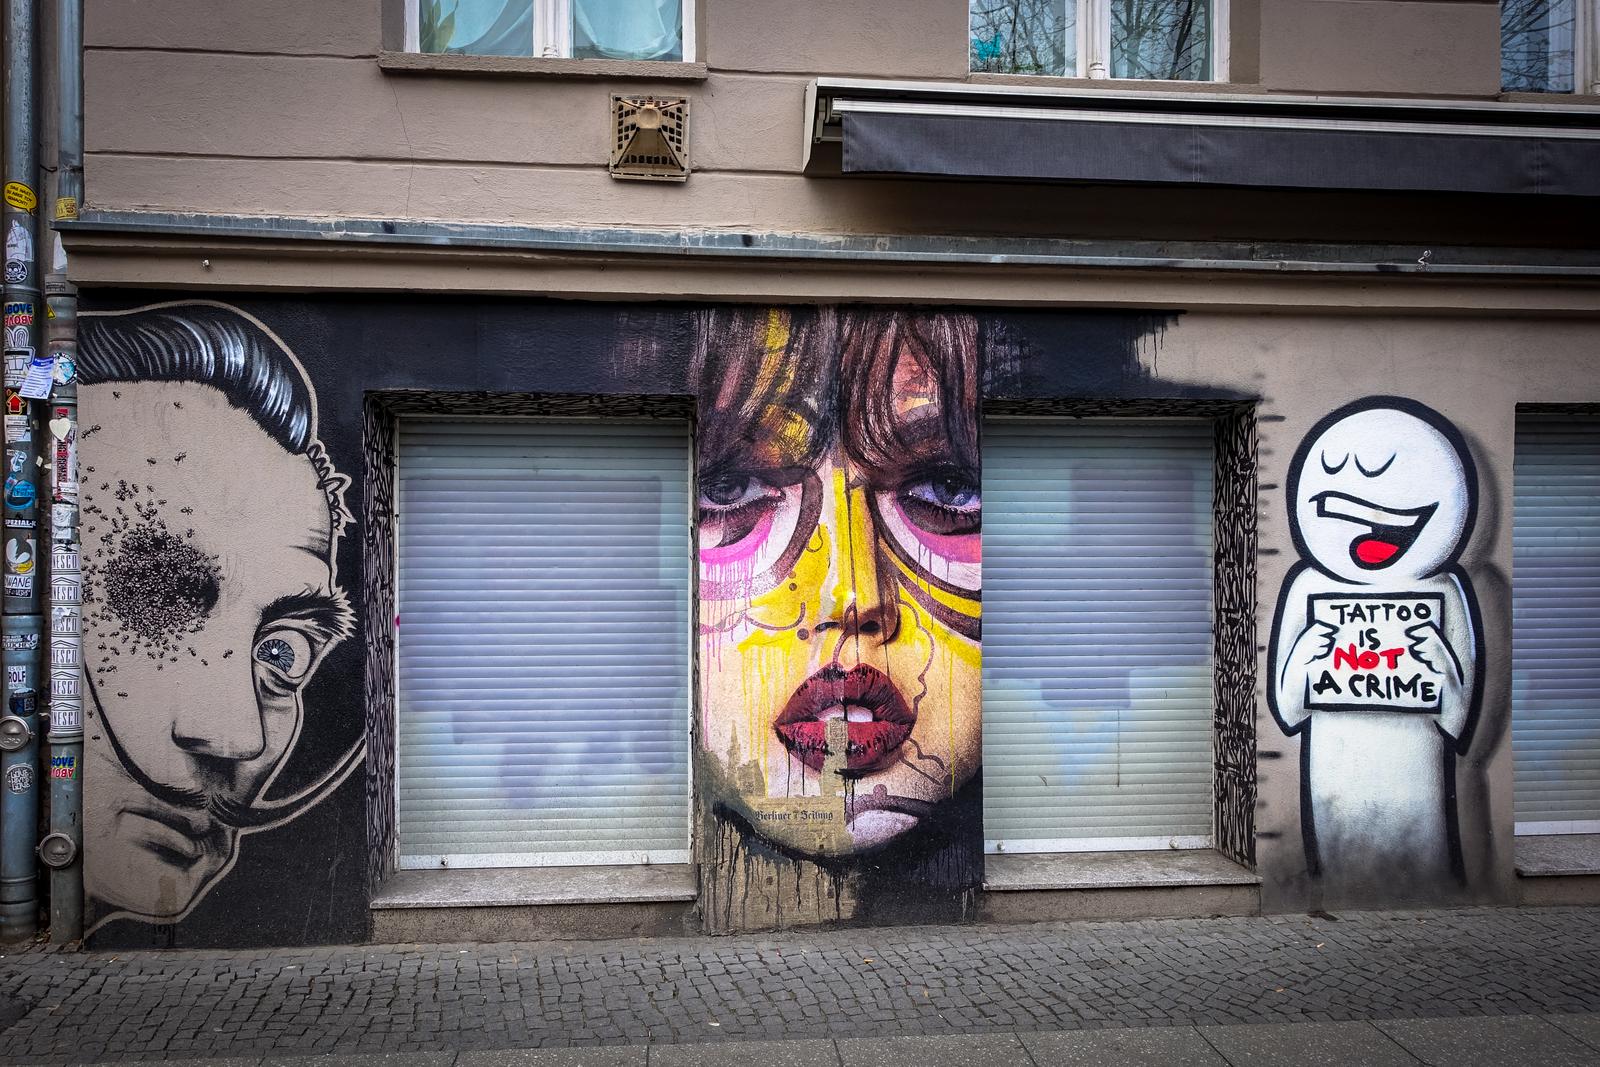 berlin street art pieces – #017 – apr III 2015